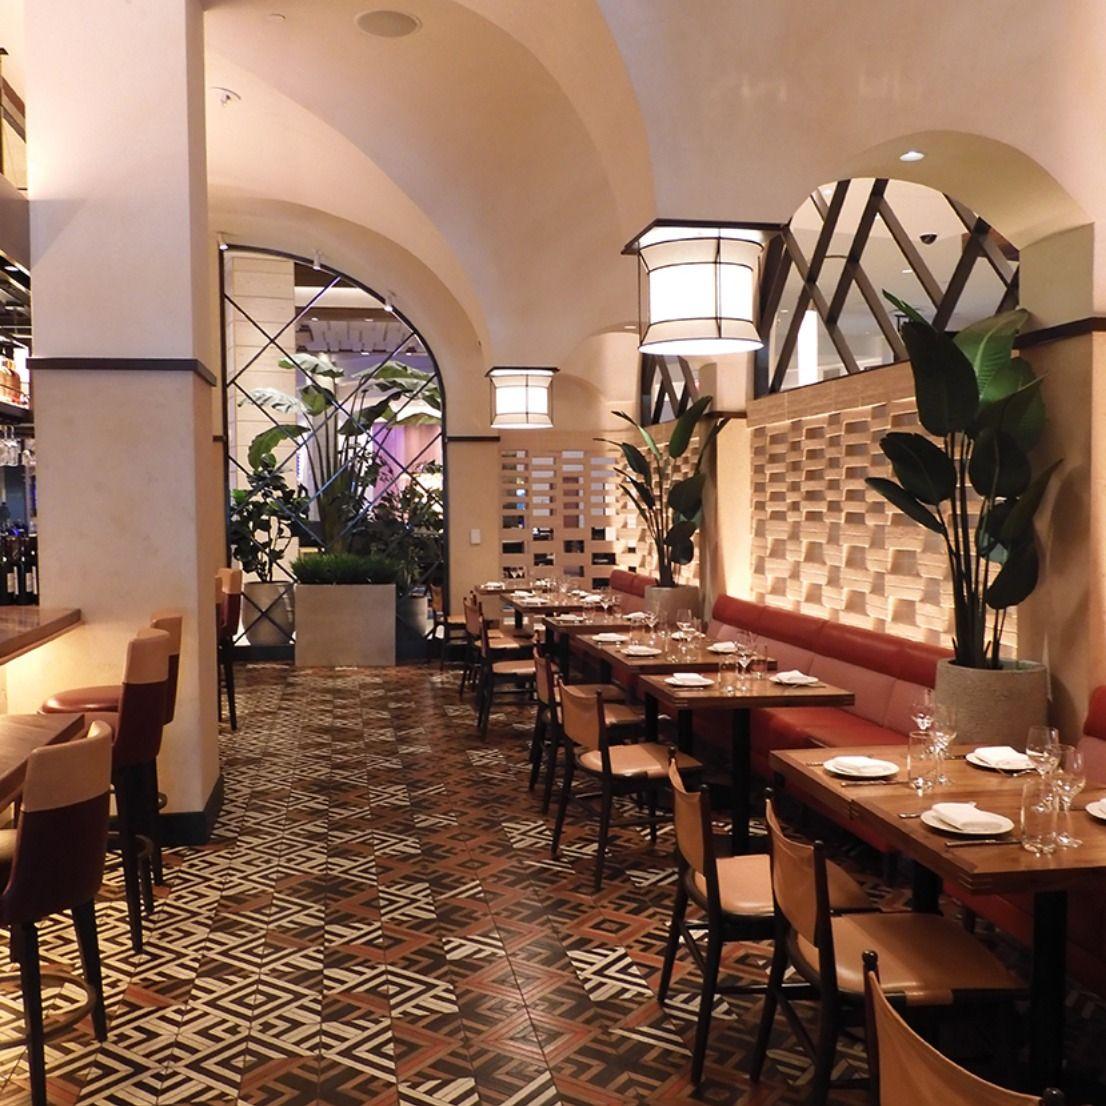 Bobby Flay's Shark Restaurant Las Vegas Plants Las vegas